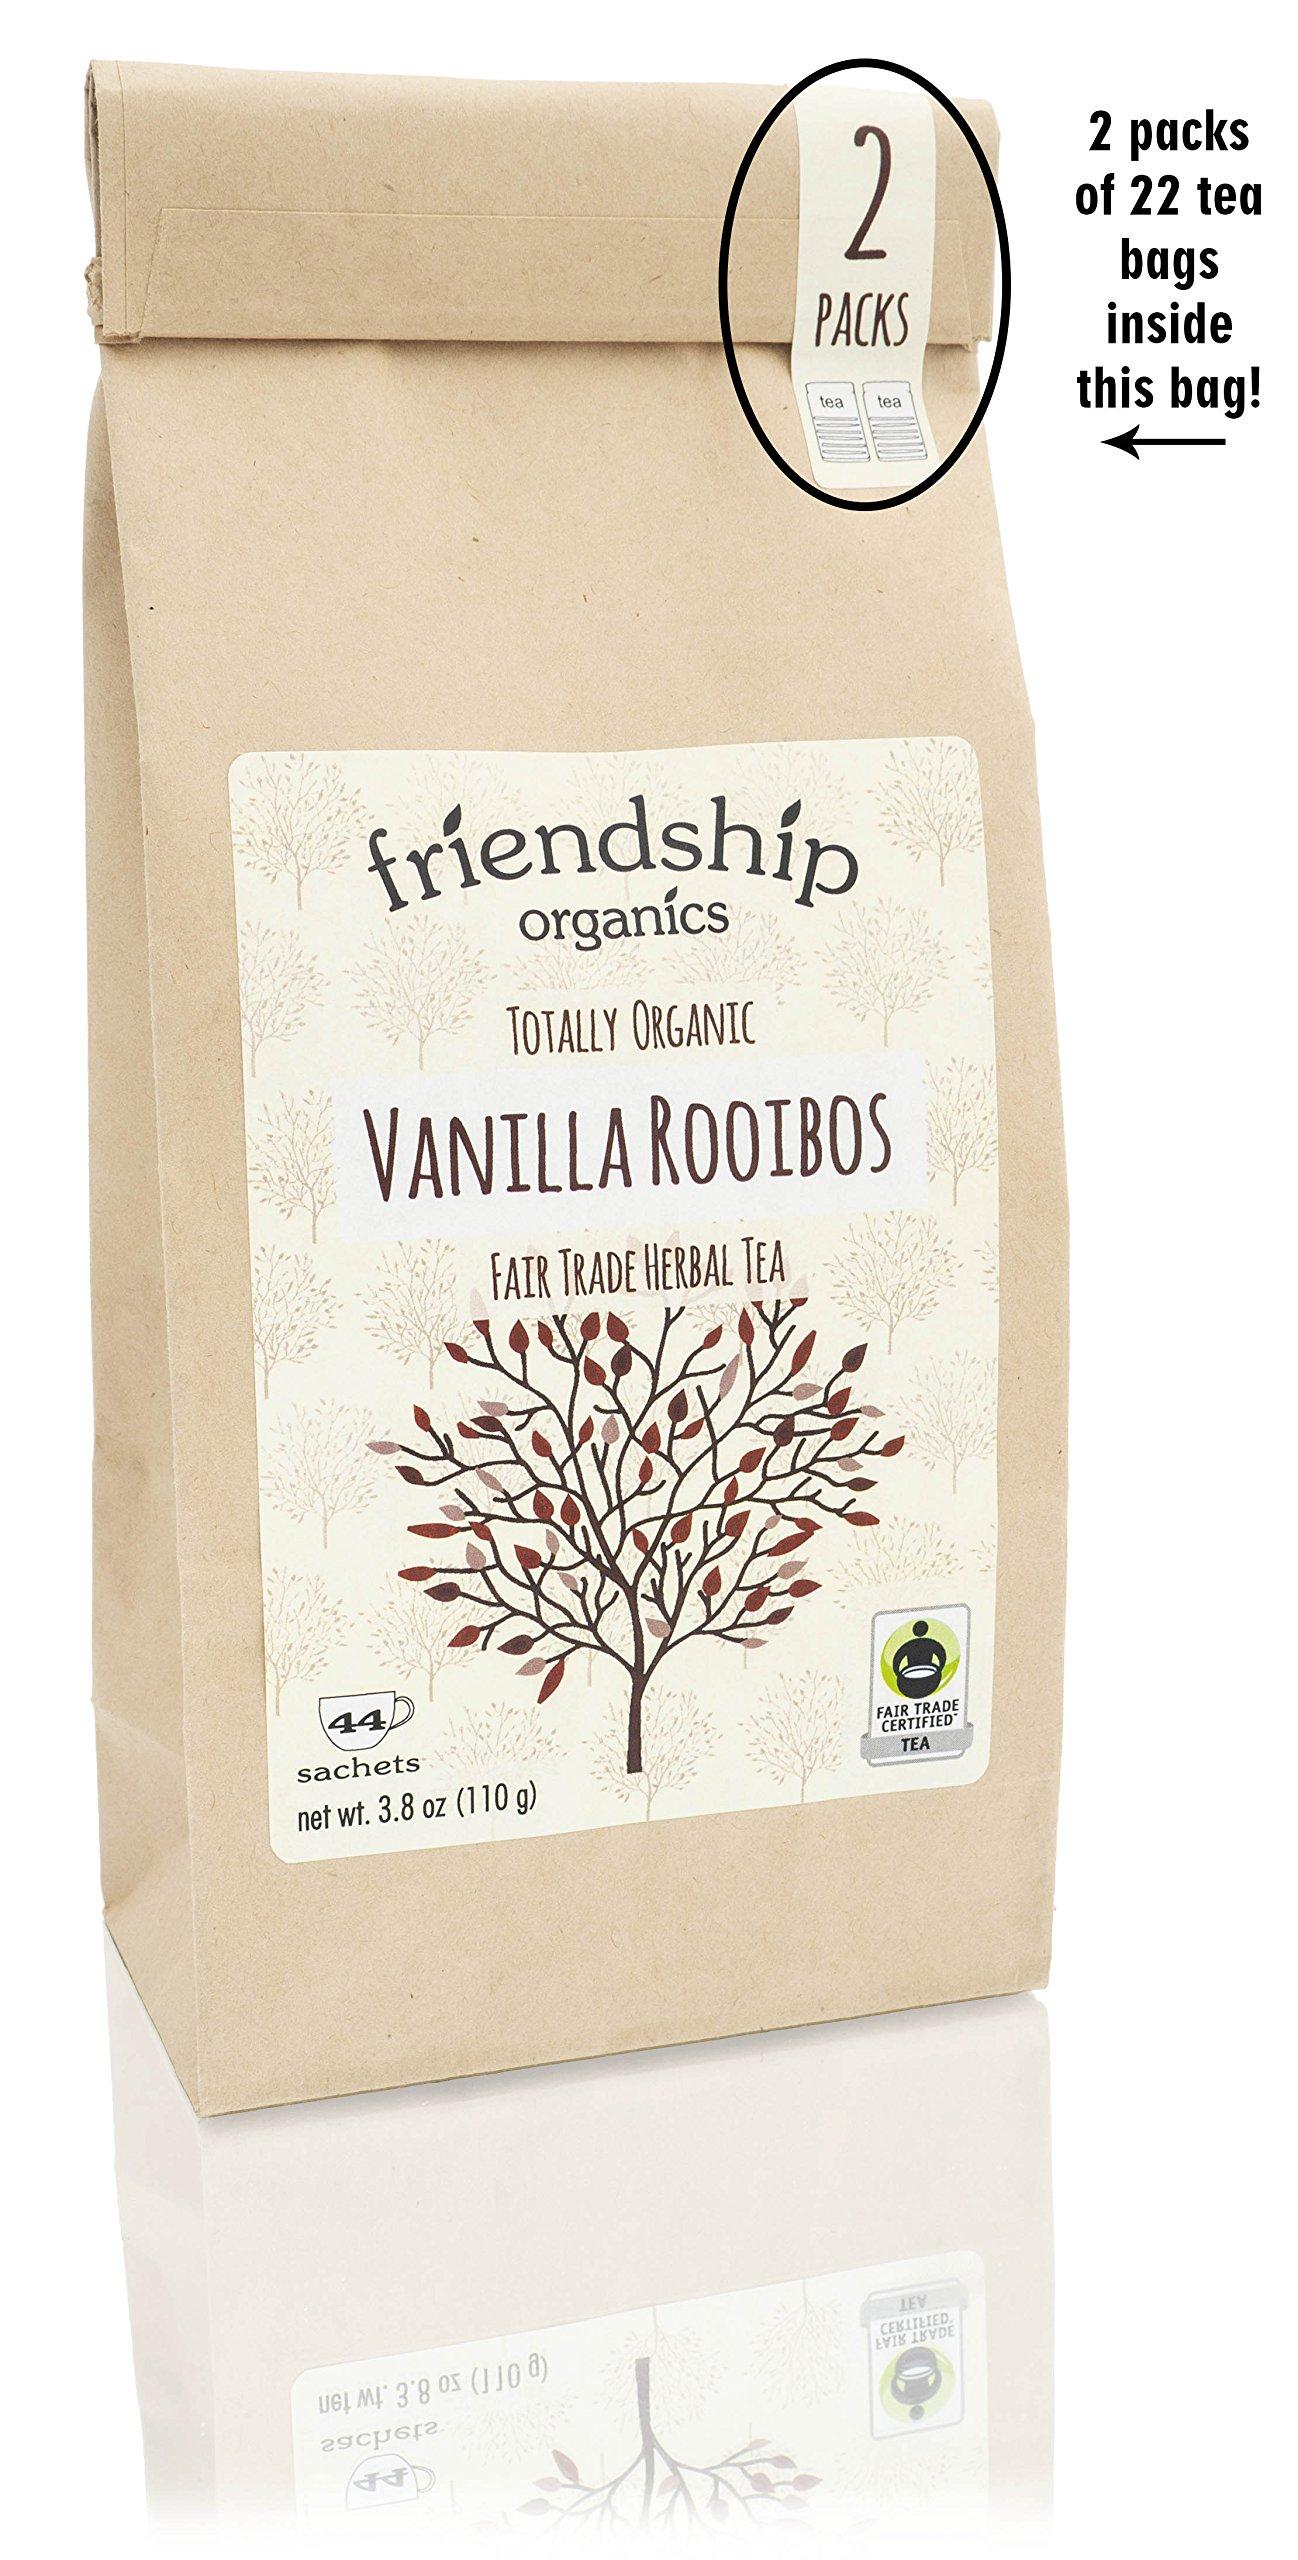 Friendship Organics Vanilla Rooibos, Totally Organic and Fair Trade Herbal Tea in Tagless Tea Bags (44 count)